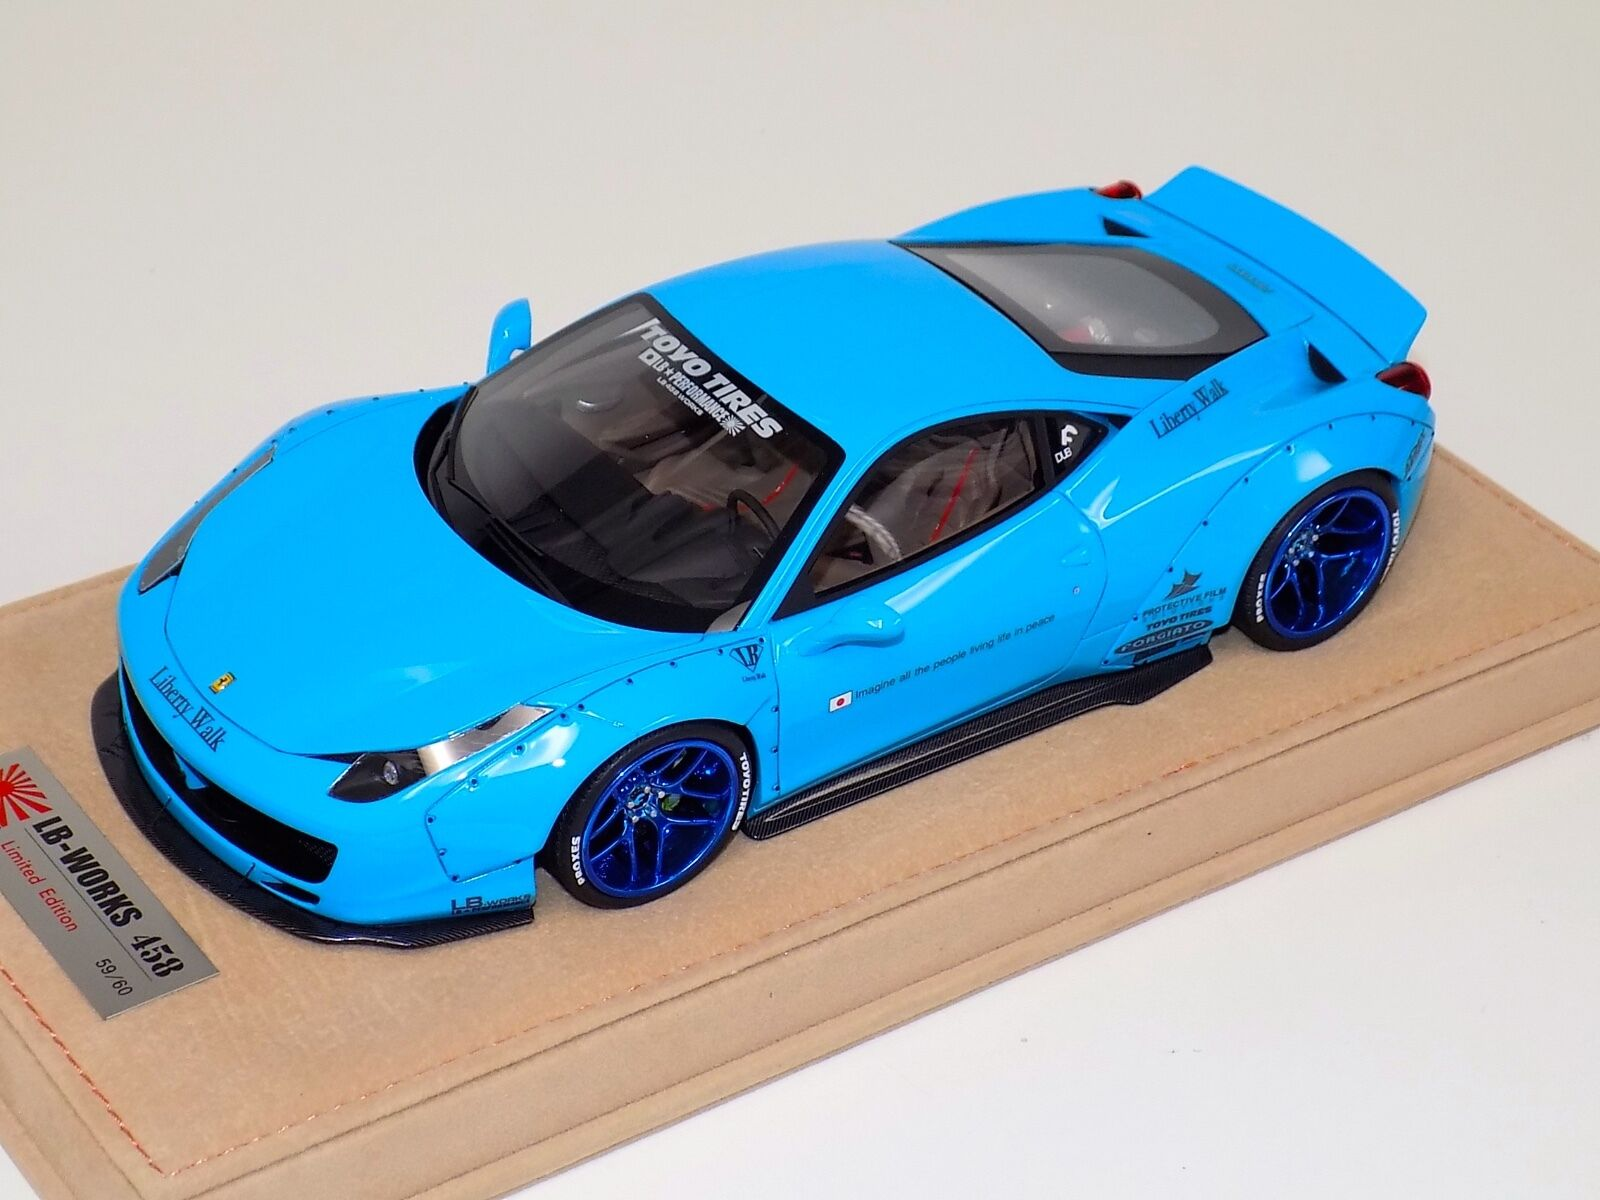 1 18 Ferrari 458 Liberty Walk LB Performance Baby bluee , bluee Wheels N BBR or MR